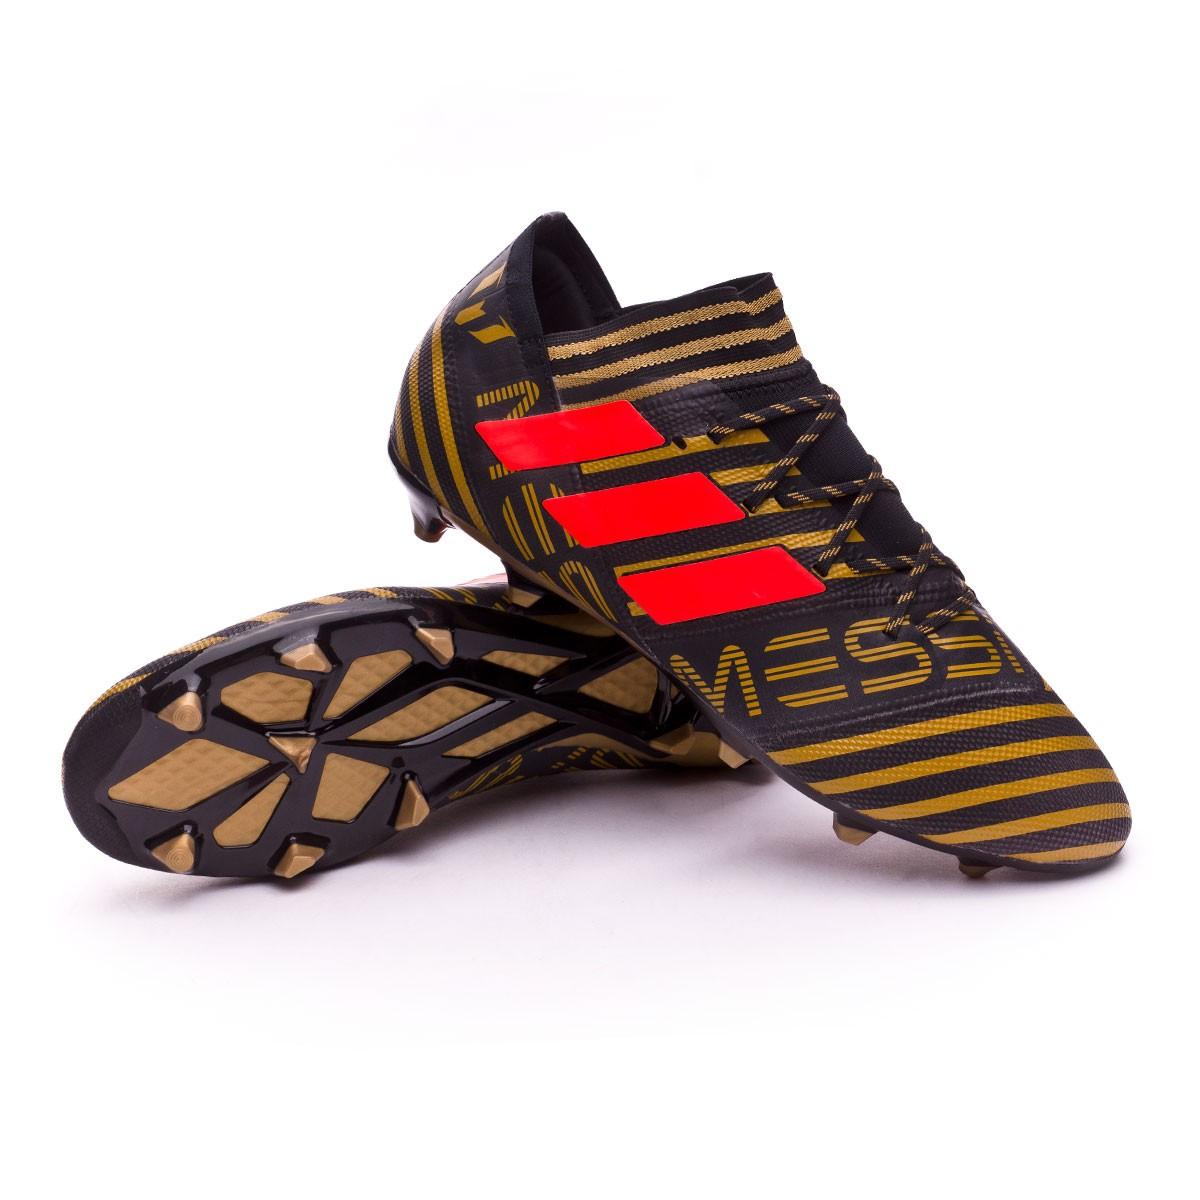 618dadbef adidas Nemeziz Messi 17.2 FG Football Boots. Core black-Solar red-Tactile  ...